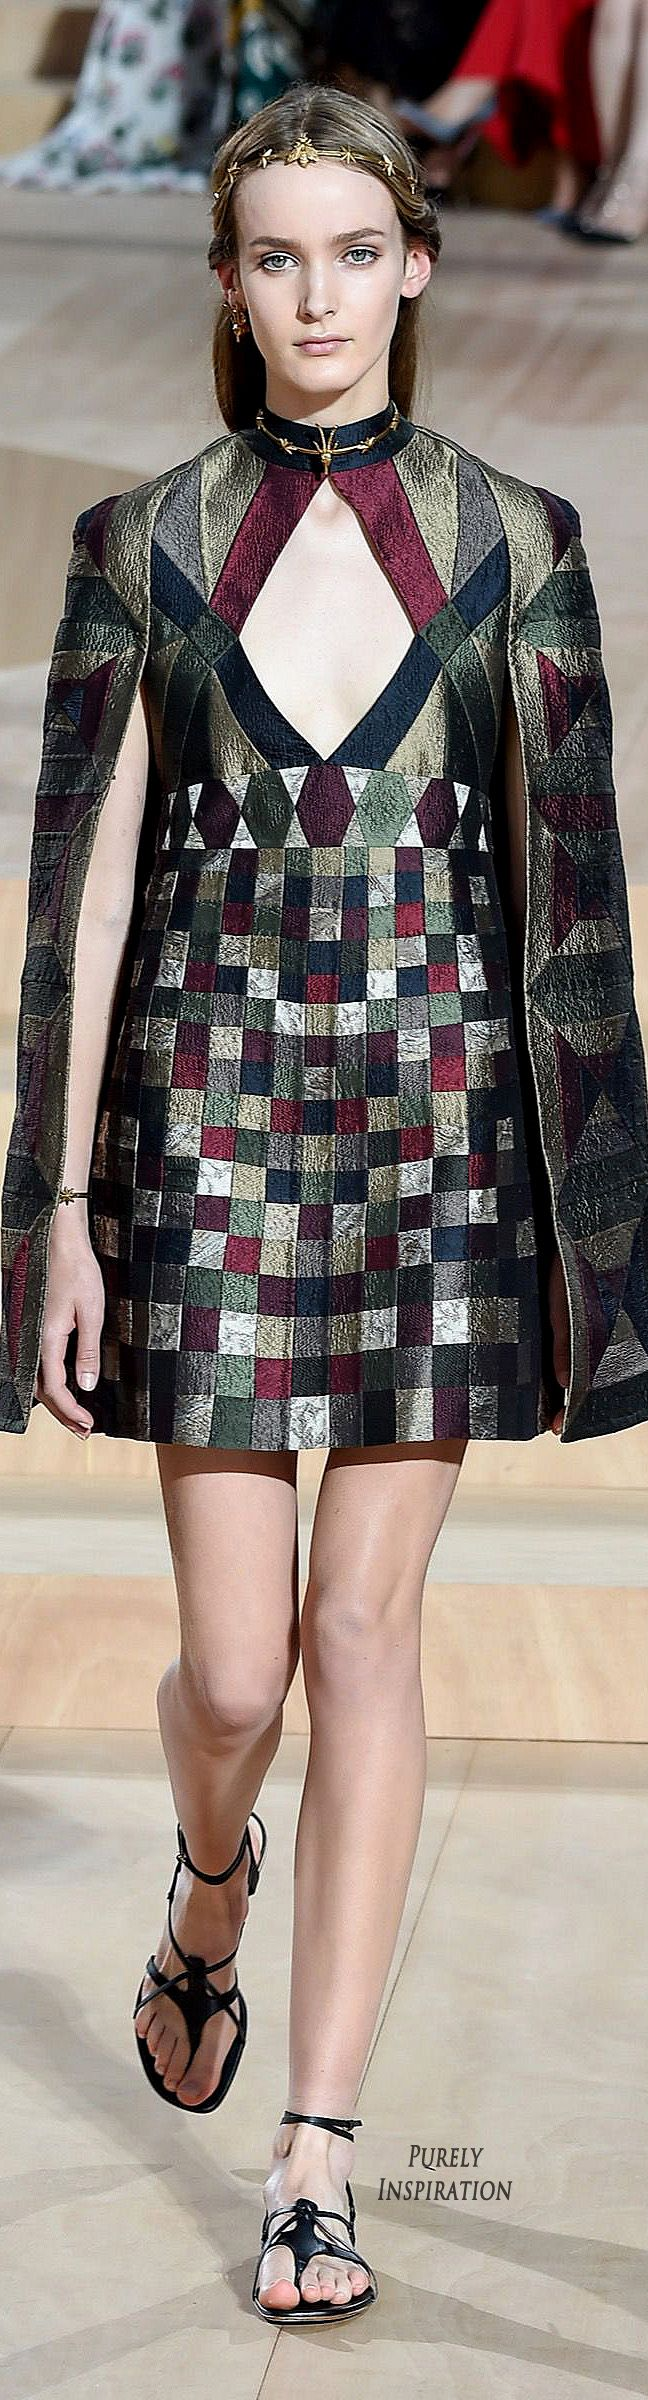 Valentino Fall 2015 Haute Couture | Purely Inspiration